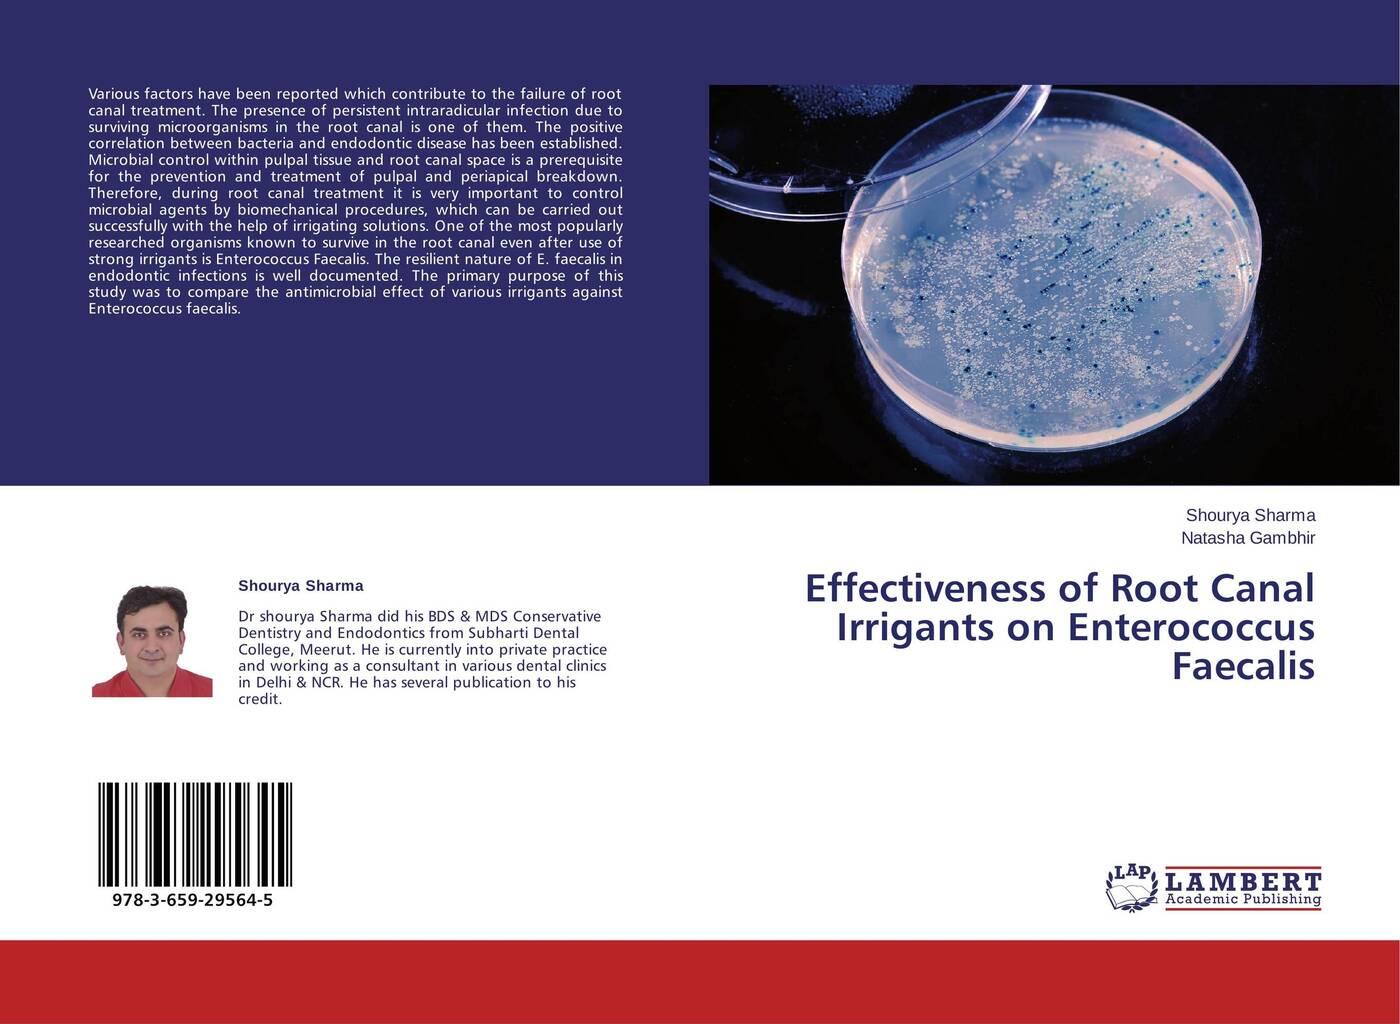 цены Shourya Sharma and Natasha Gambhir Effectiveness of Root Canal Irrigants on Enterococcus Faecalis